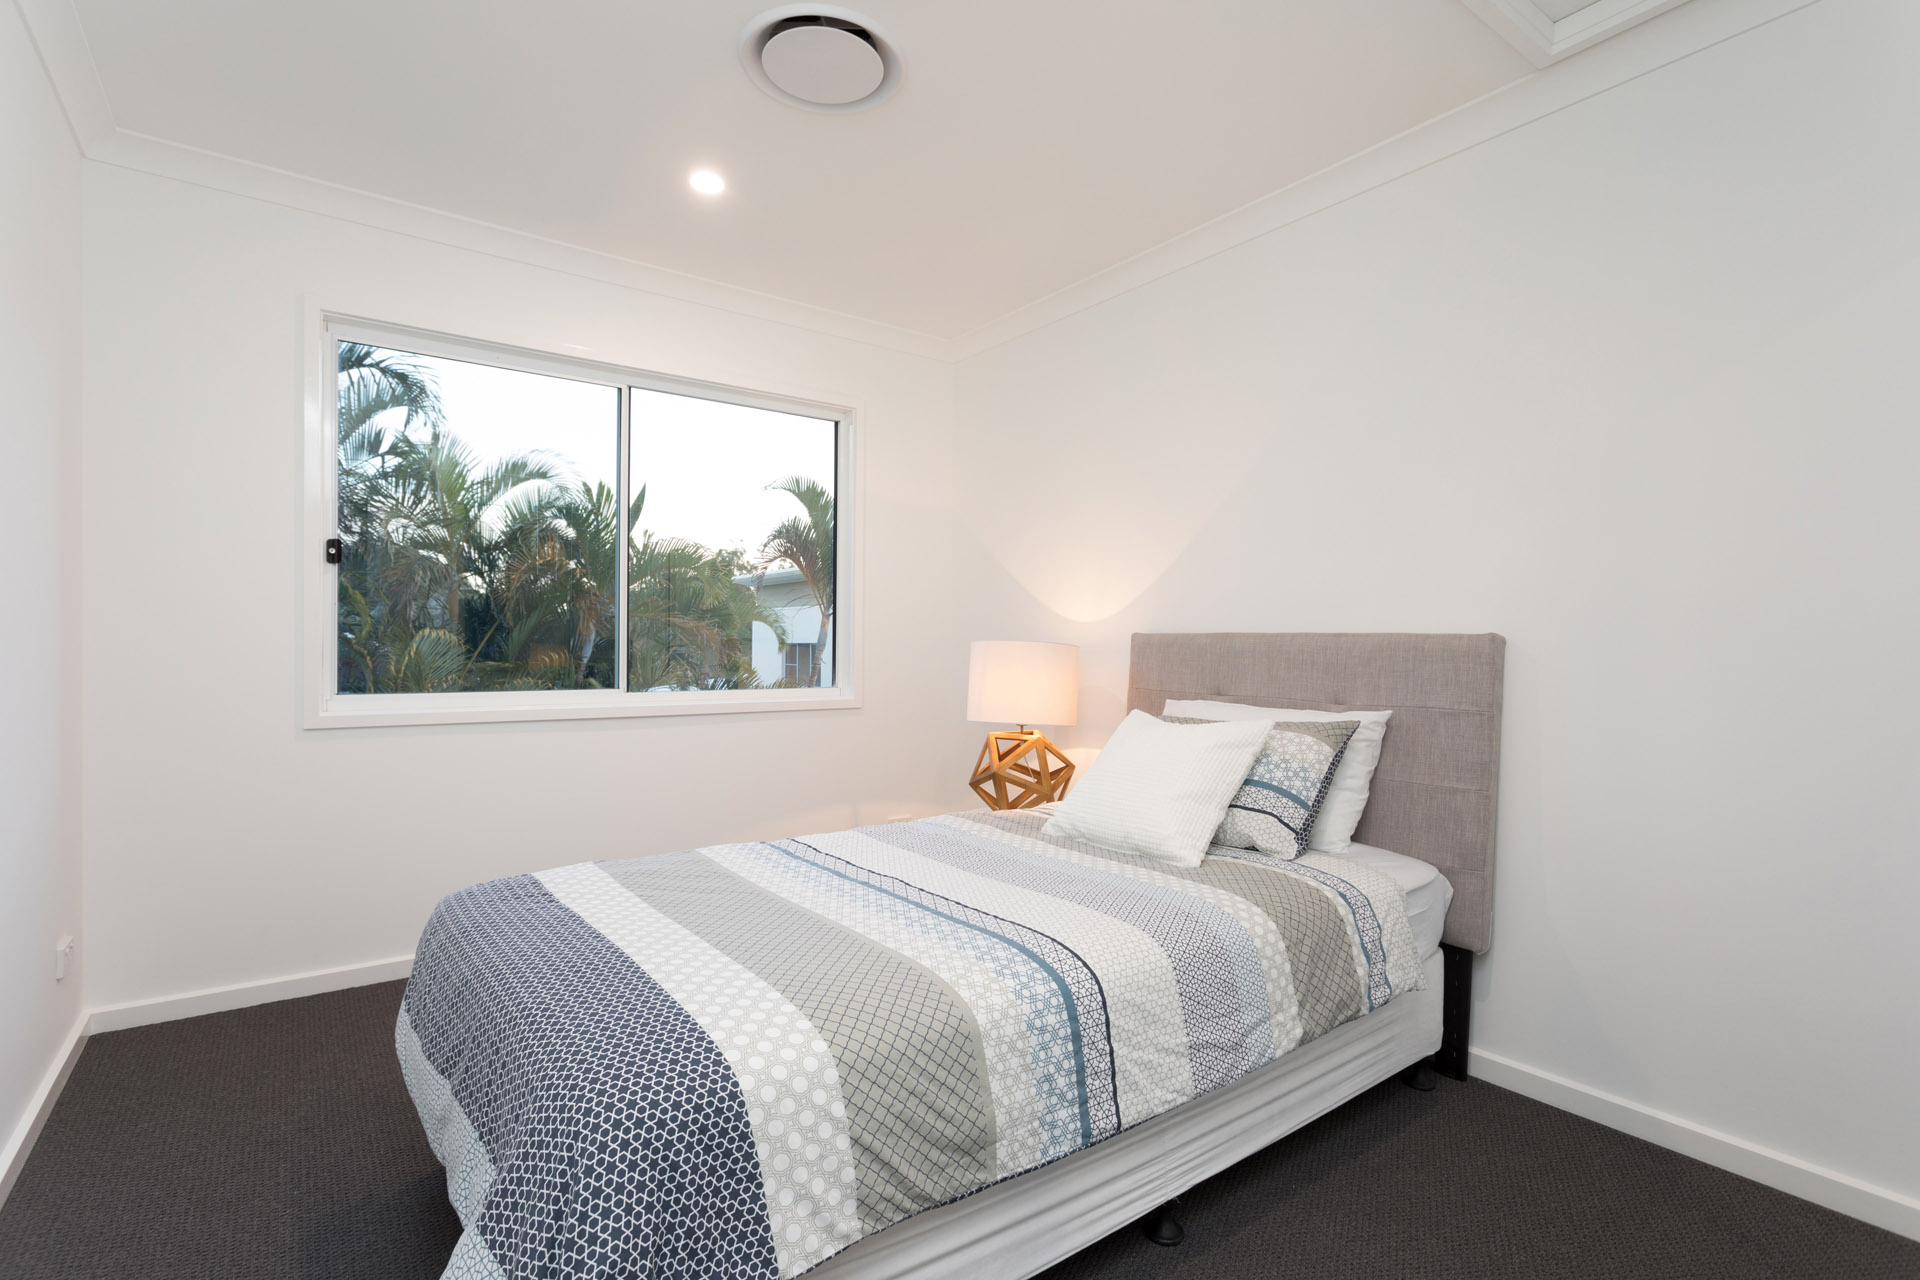 Real Estate | Gold Coast | Chevron Realty | 20180822 0b4a7087